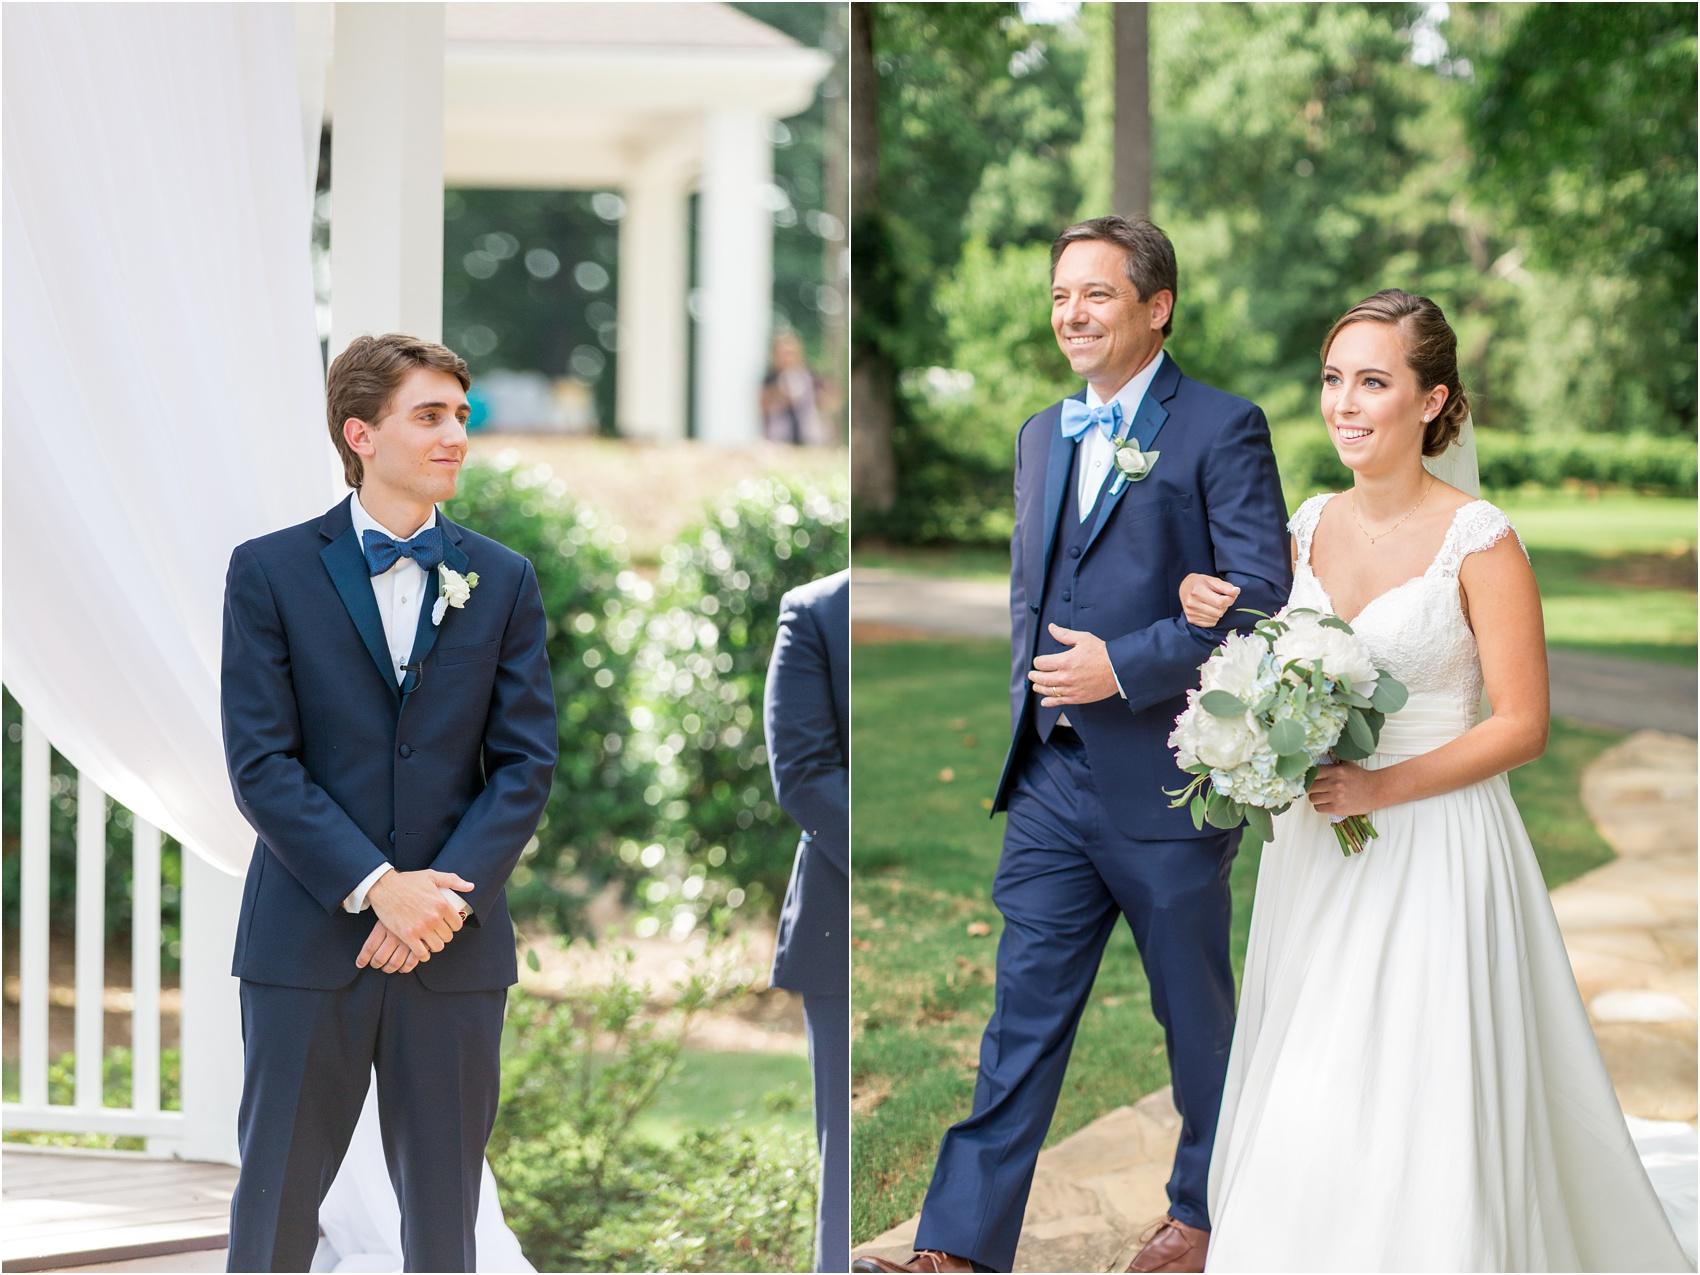 Savannah Eve Photography- Sigl-Adams Wedding- Sneak Peek-33.jpg